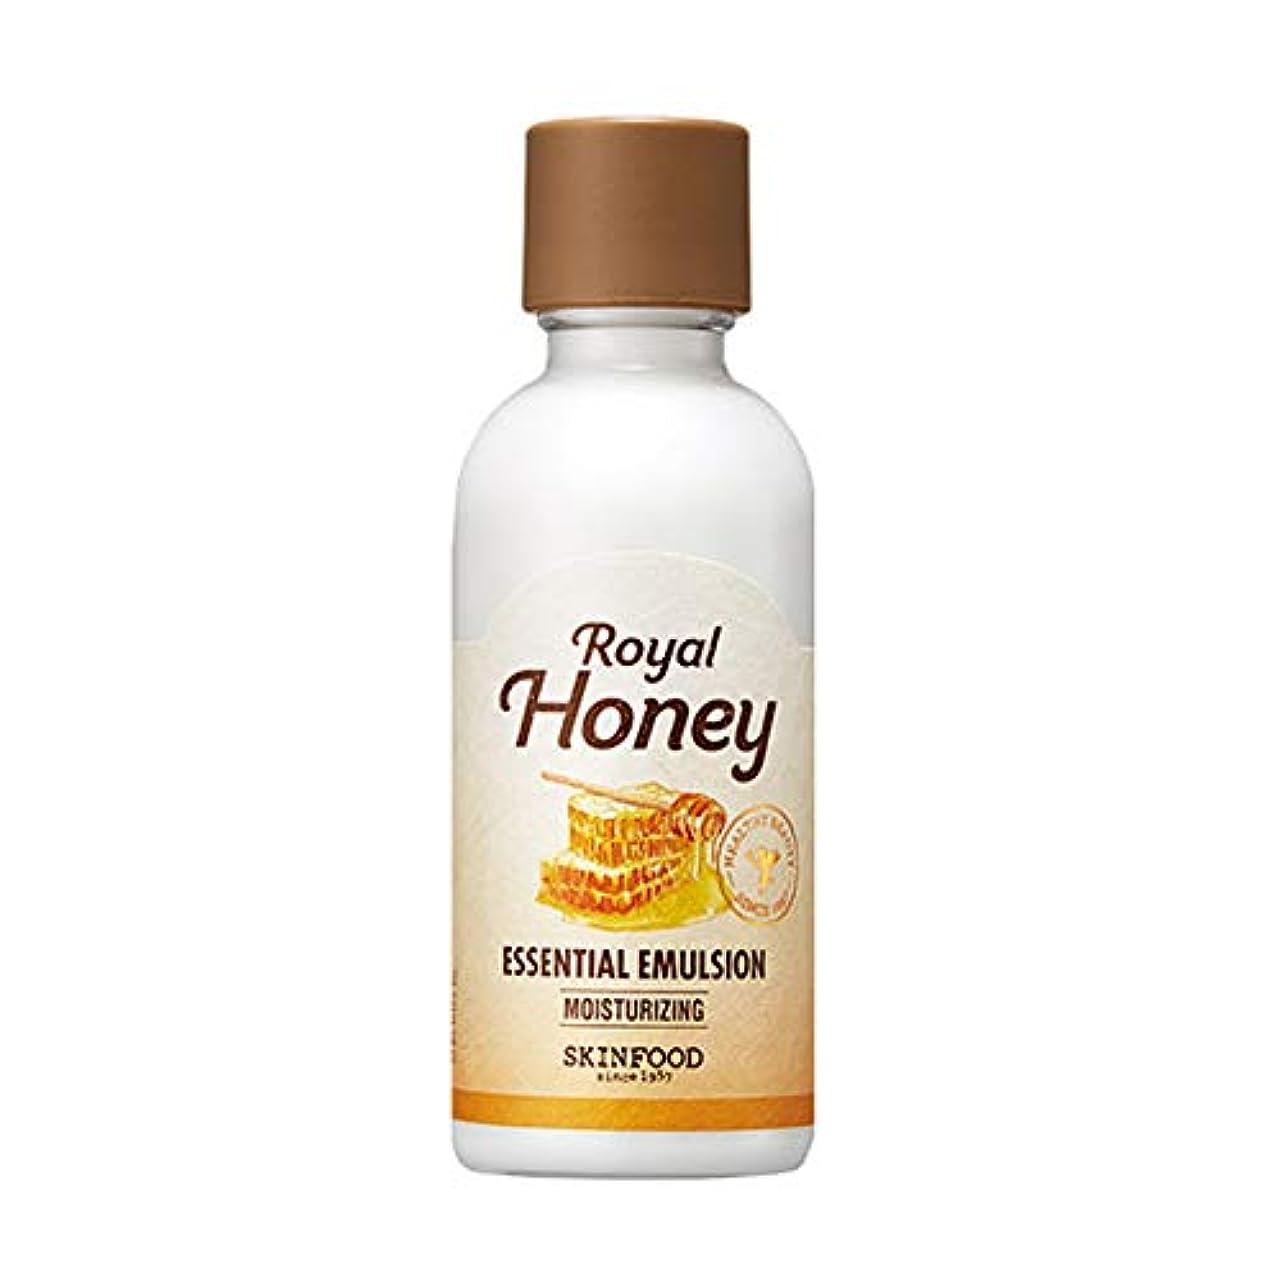 Skinfood ロイヤルハニーエッセンシャルエマルジョン/Royal Honey Essential Emulsion 160ml [並行輸入品]